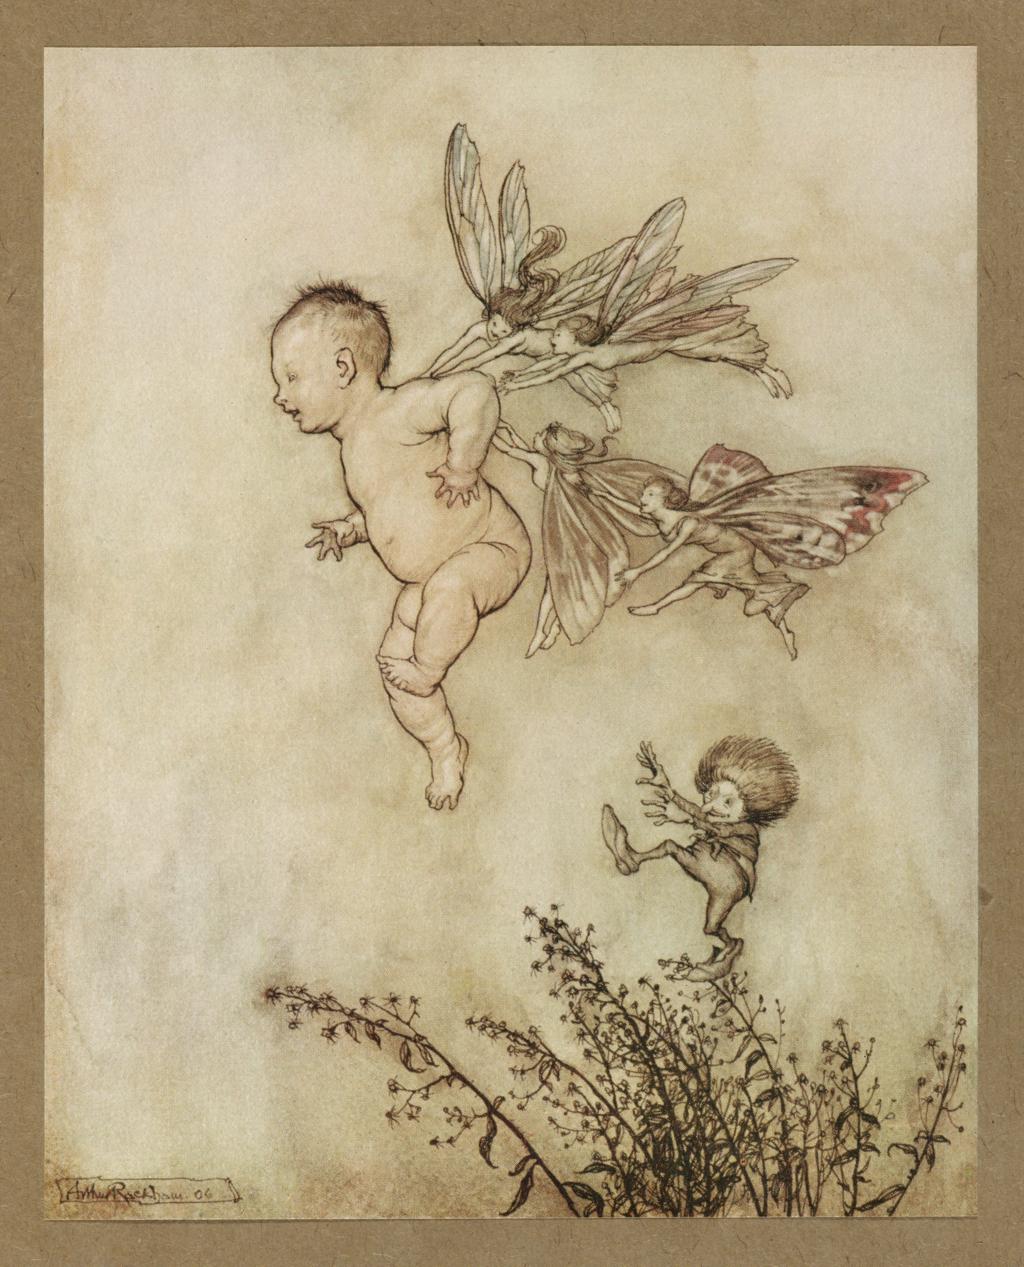 Peter Pan illustration by Arthur Rackham